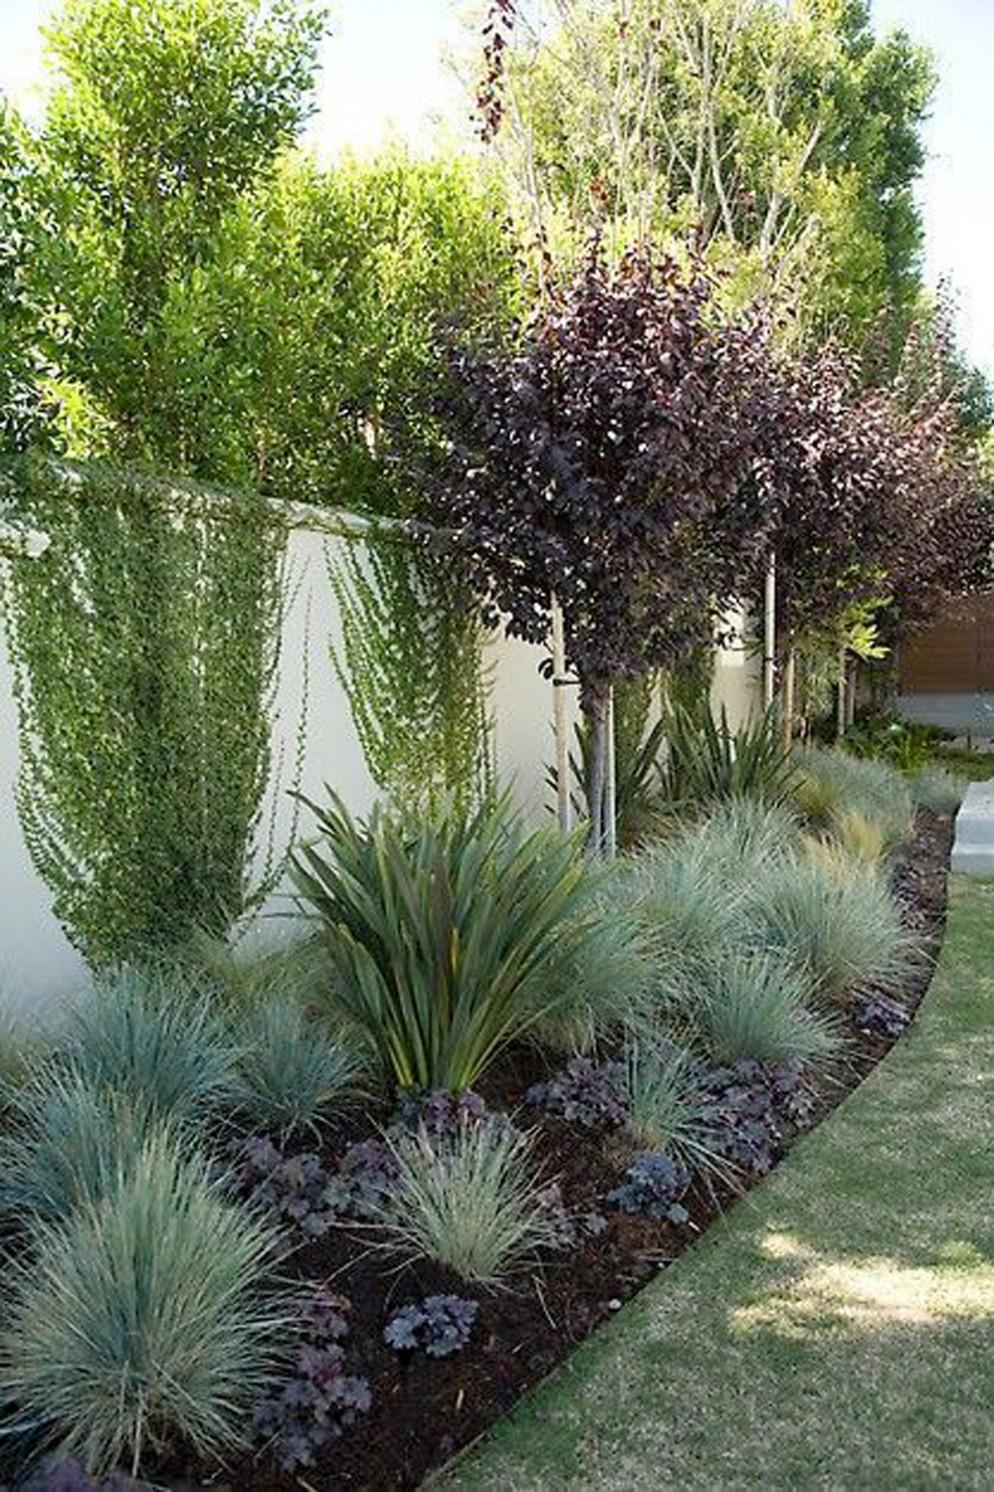 alberi-da-giardino-sempreverdi-8. ashadeifteal.comliving-corriere